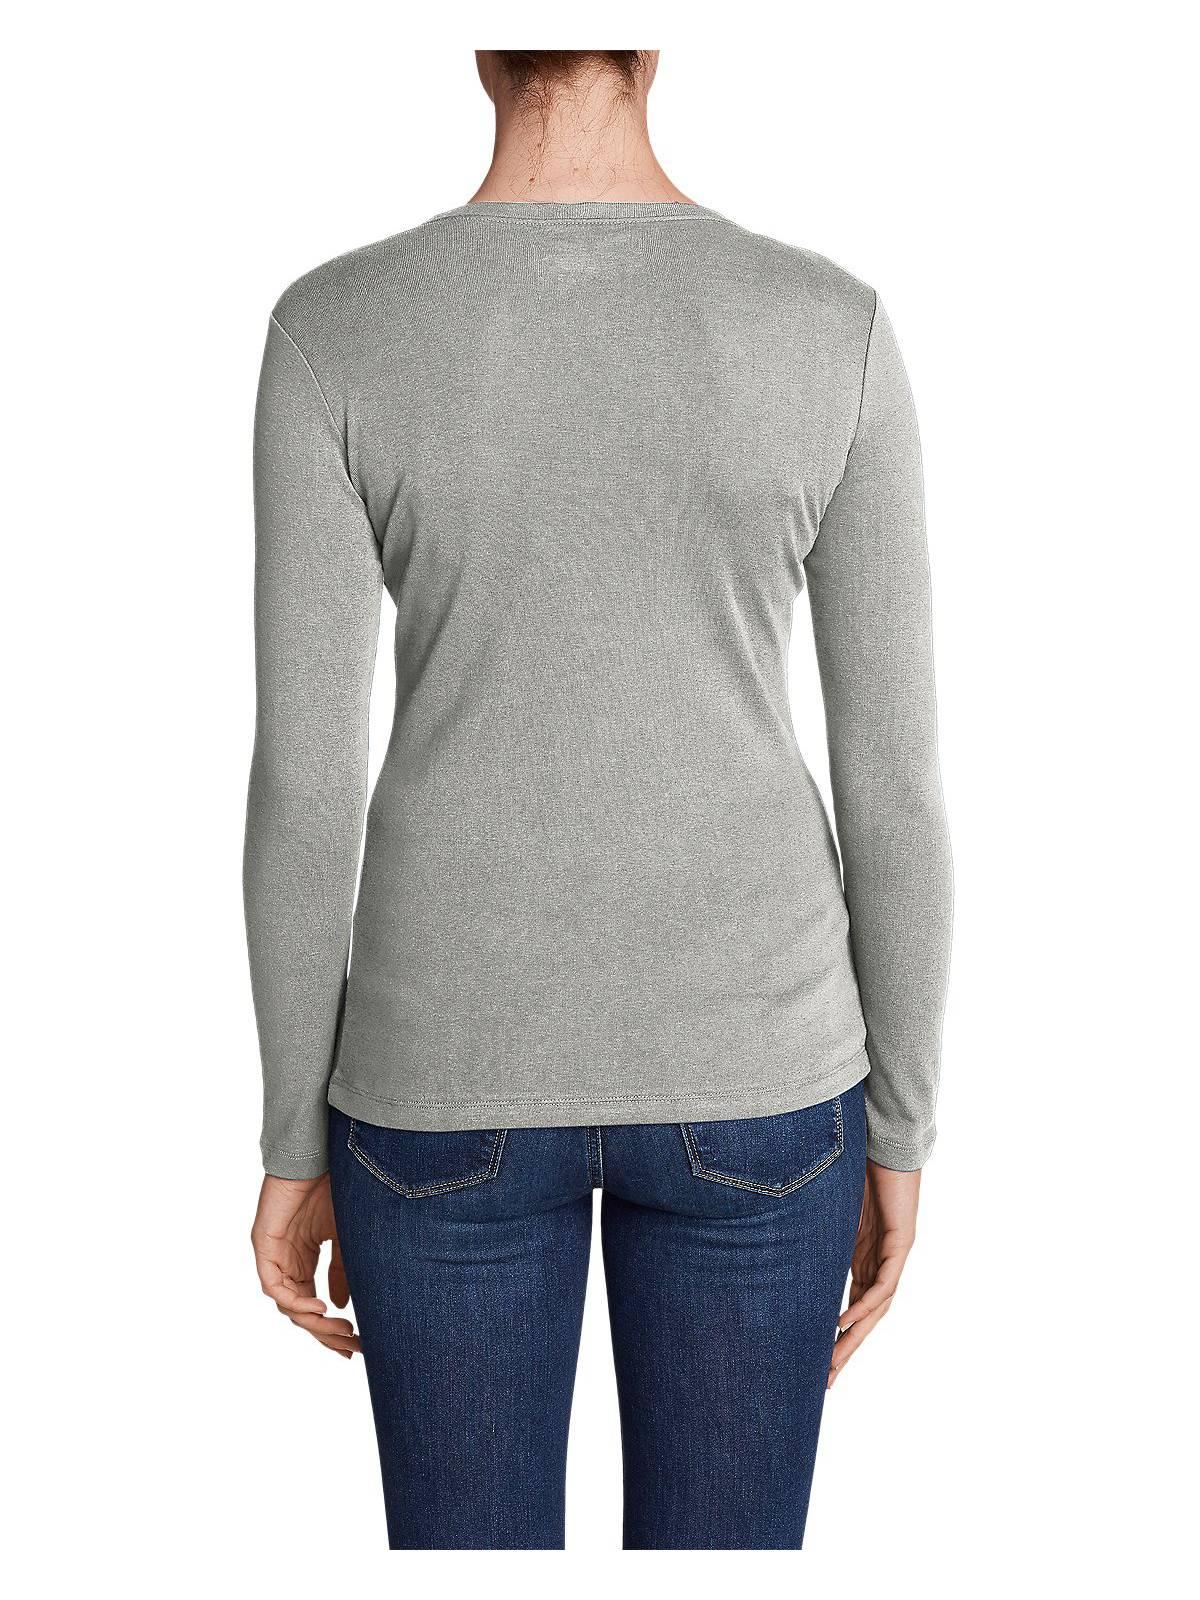 Eddie-Bauer-Women-039-s-Favorite-Long-Sleeve-Crewneck-T-Shirt thumbnail 24